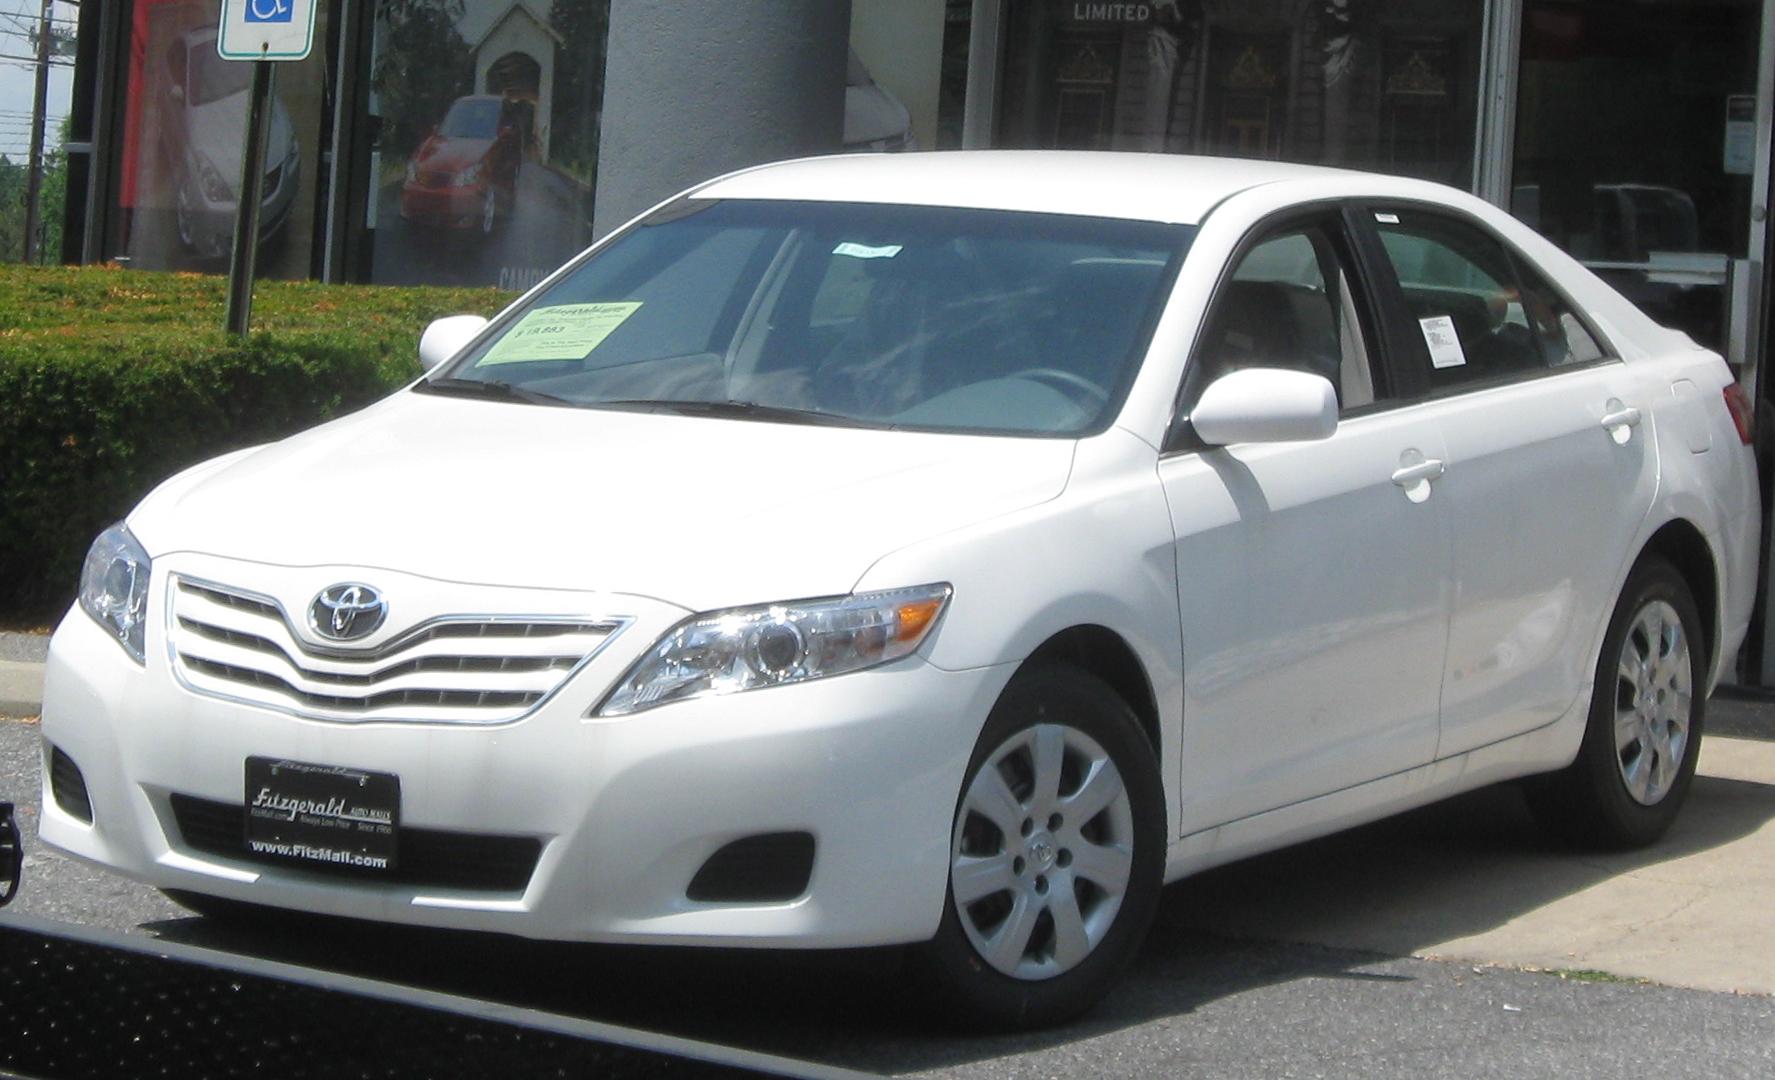 2010 Toyota Camry Image 20